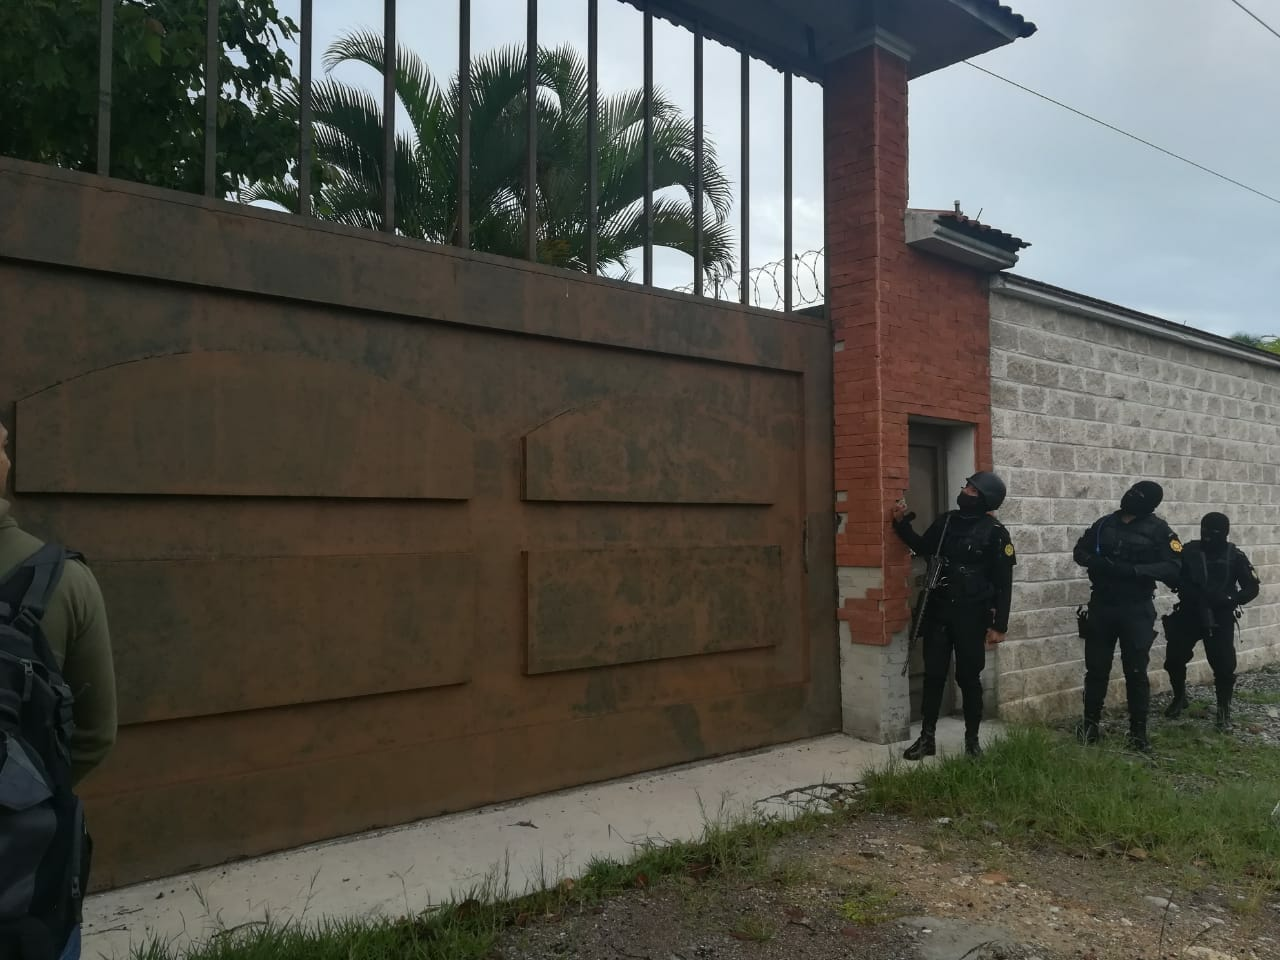 Portal Noticias Veracruz: Operativo transnacional desarticula grupo criminal en Guatemala